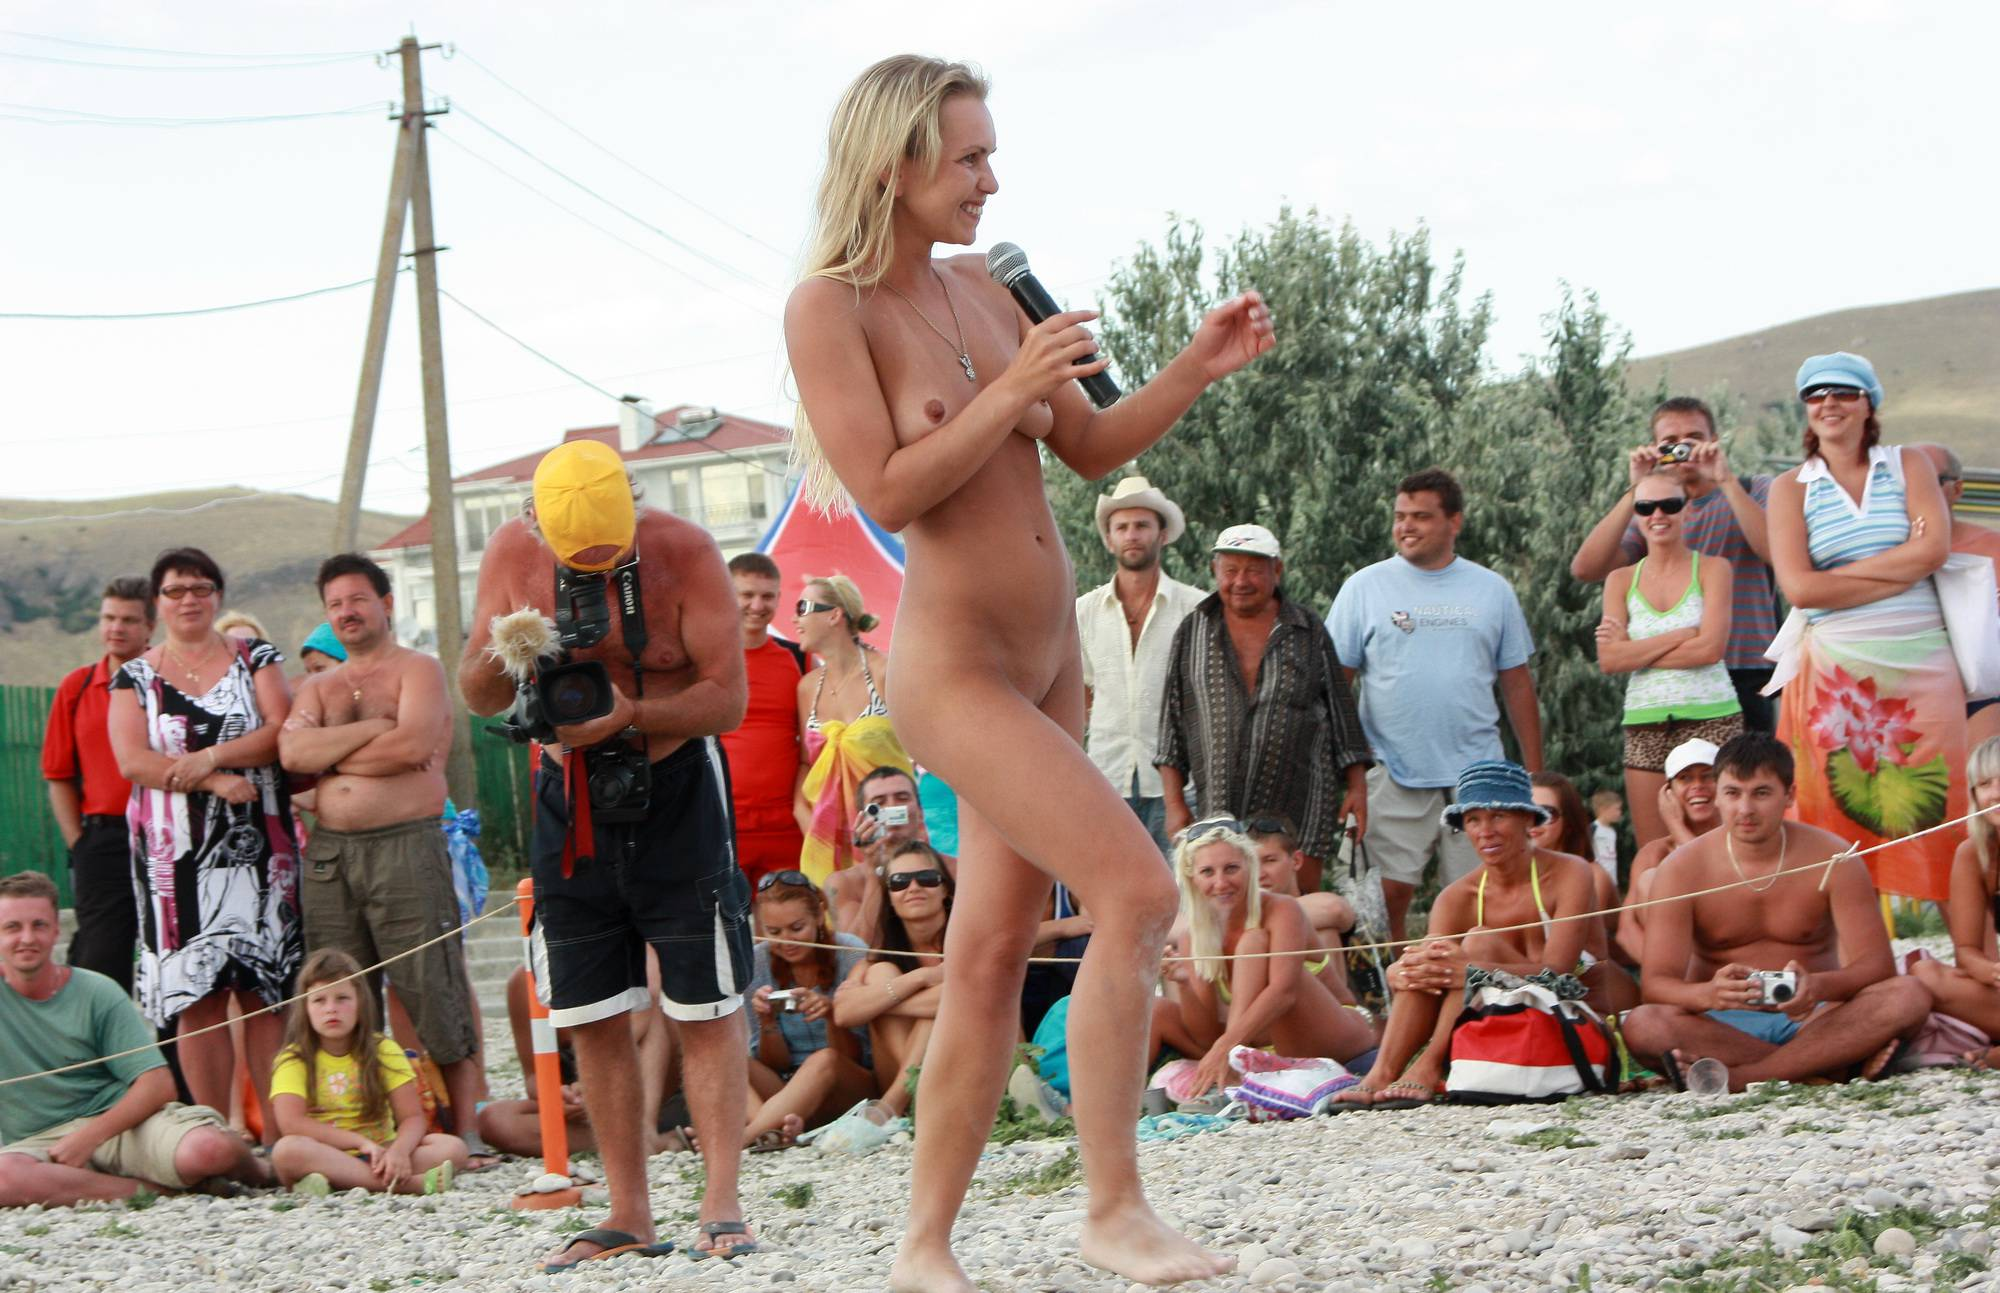 Purenudism Neptune Blonde Girl Dance - 1